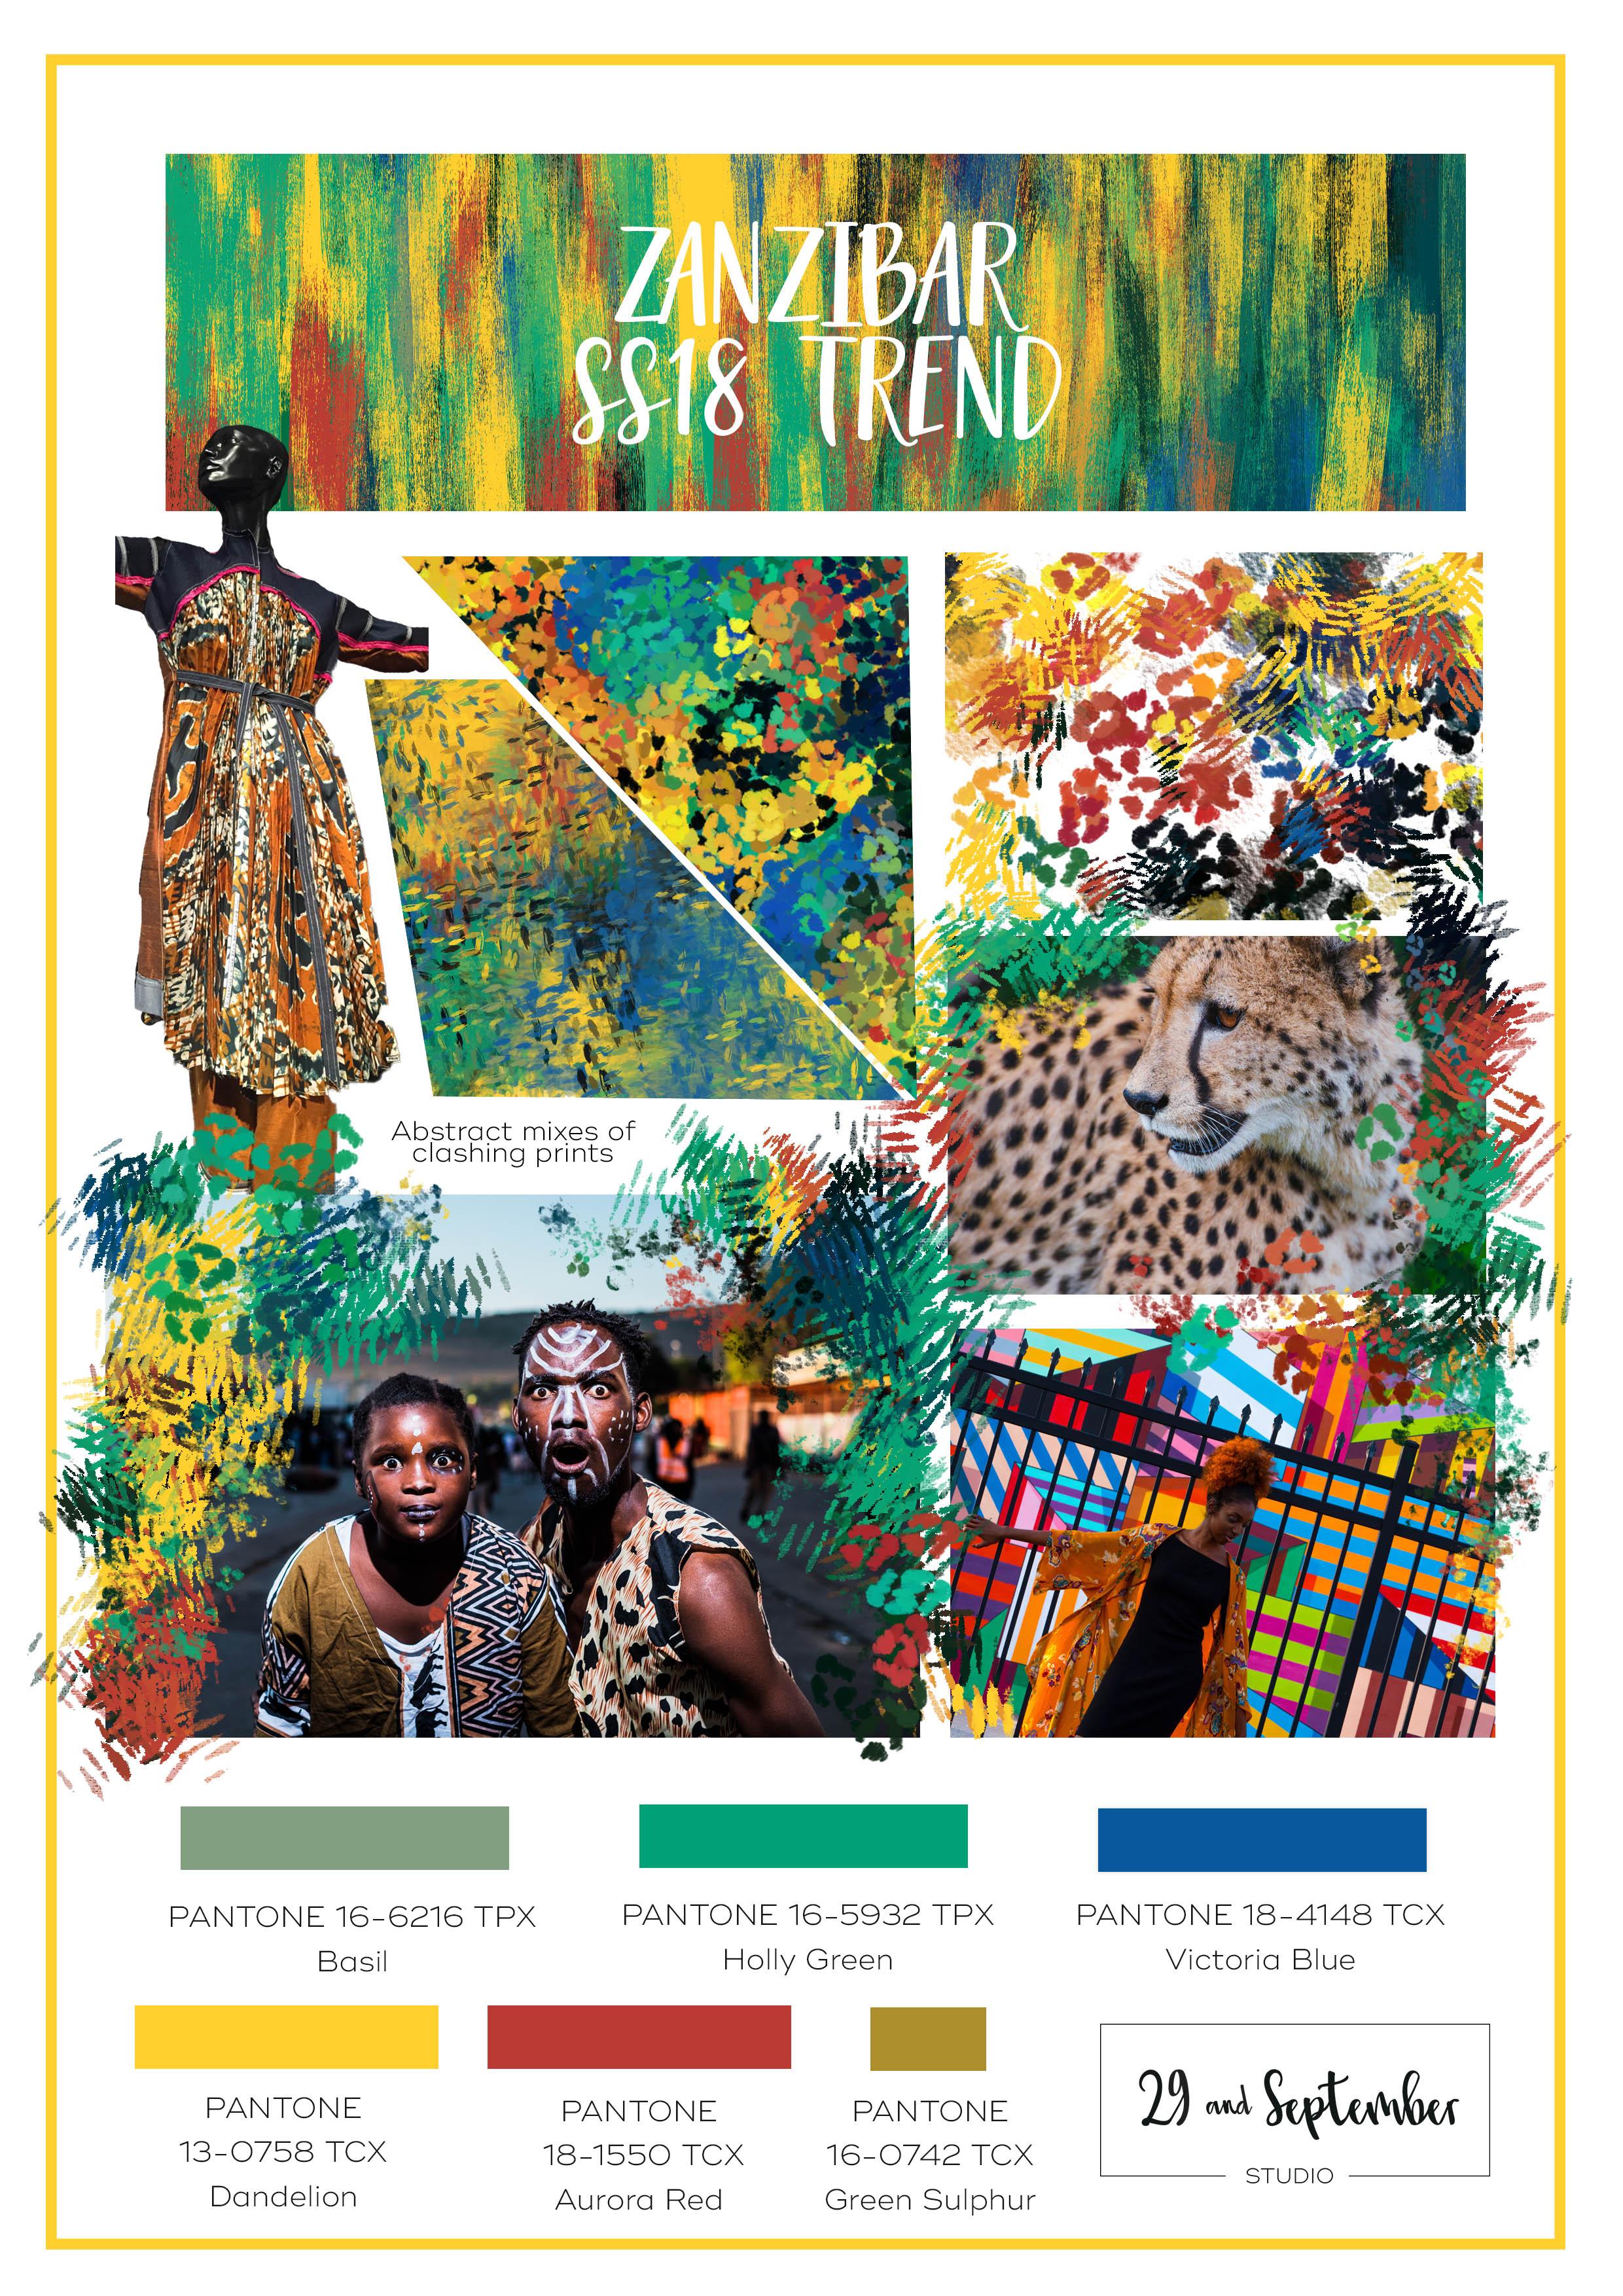 S/S 2018 trends; Zanzibar free trend board information from 29andSeptember Studio